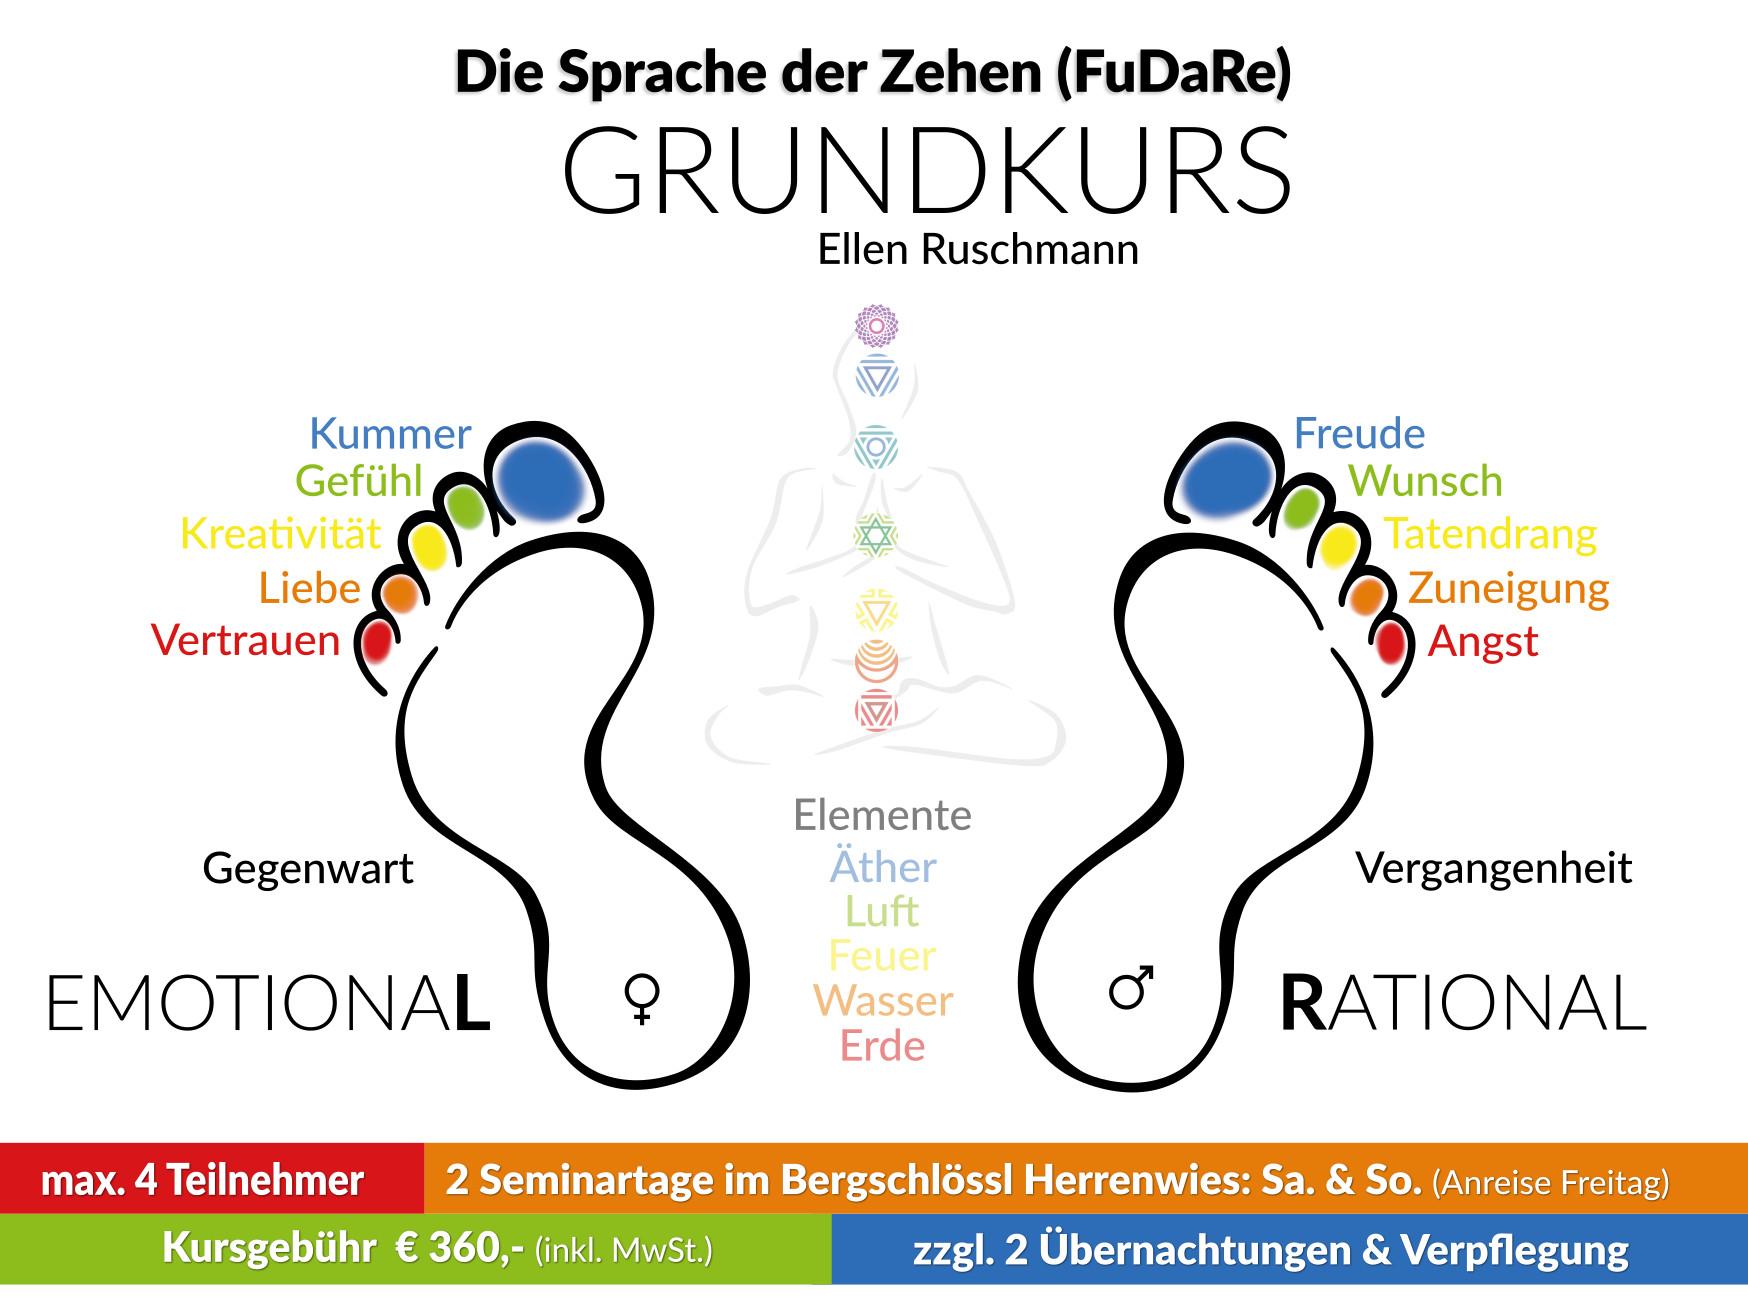 Ausbildung Zehenlesen FuDaRe Grundseminar 2019 bei Ellen Ruschmann